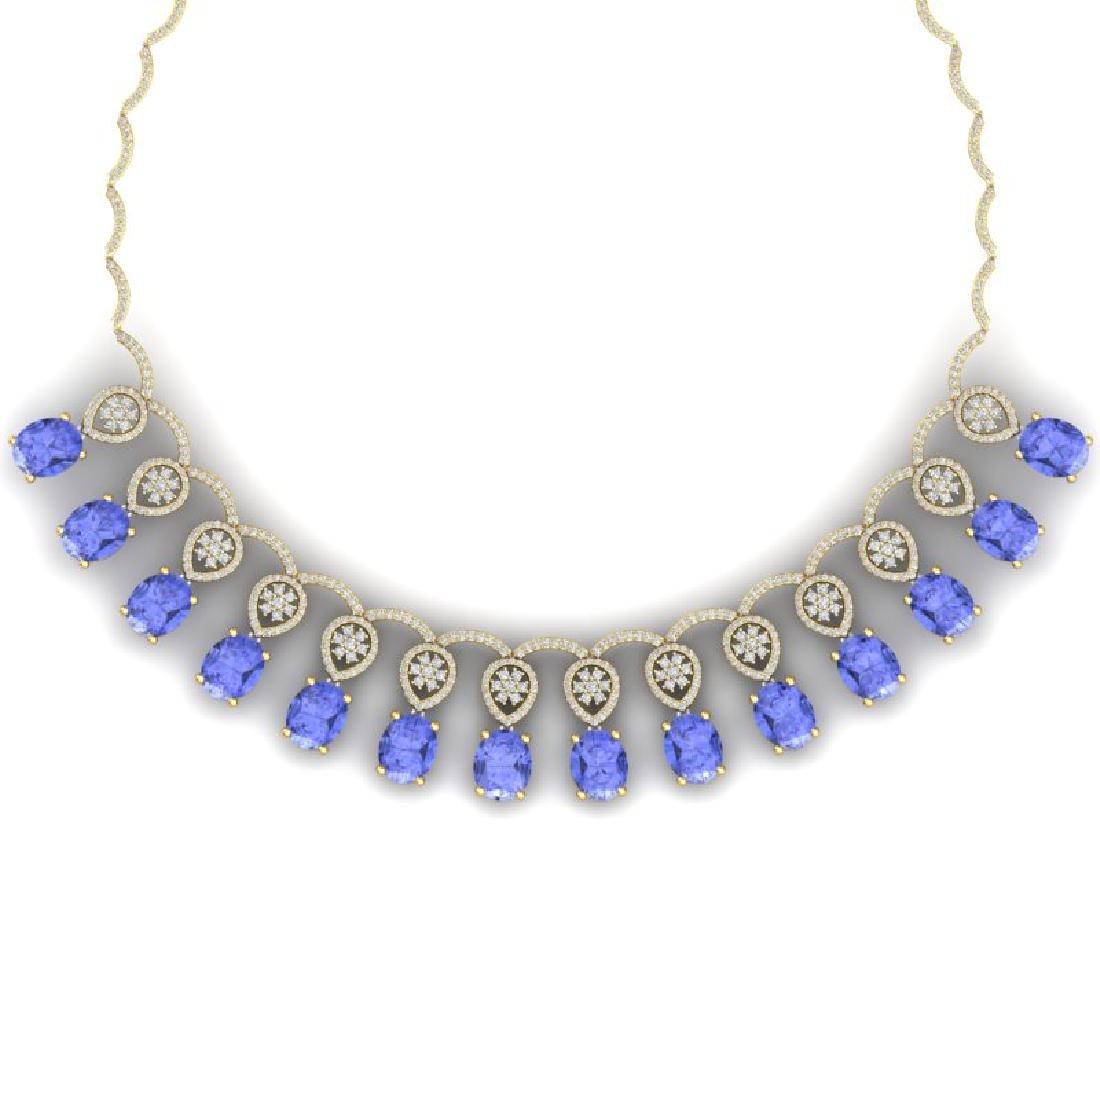 45.56 CTW Royalty Tanzanite & VS Diamond Necklace 18K - 2